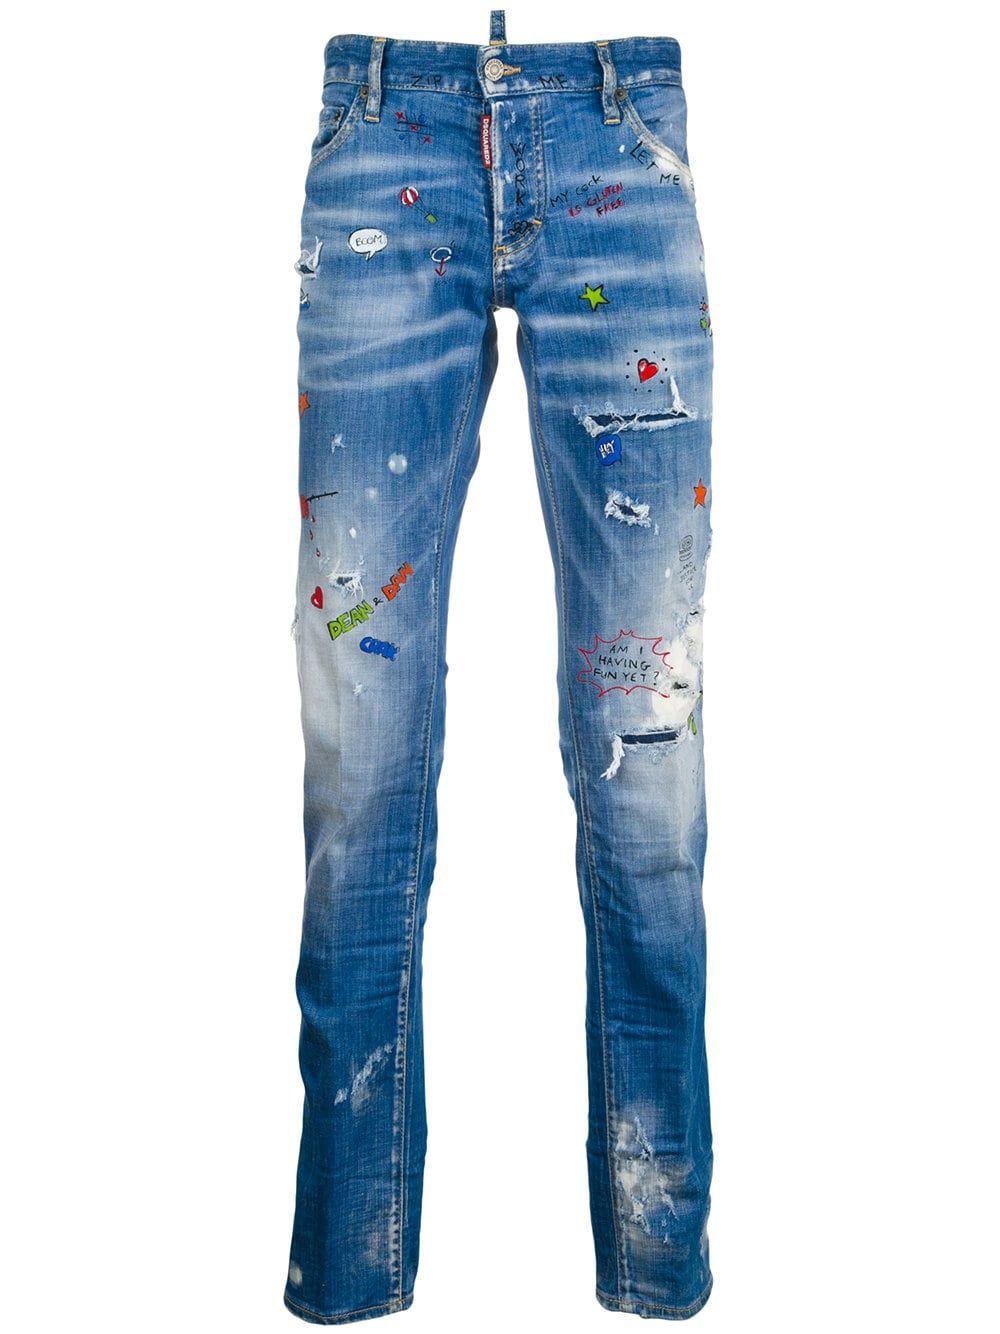 5b63c2c8 Dsquared2 slim graffiti distressed jeans | ReViVaList DeNiM in 2019 ...